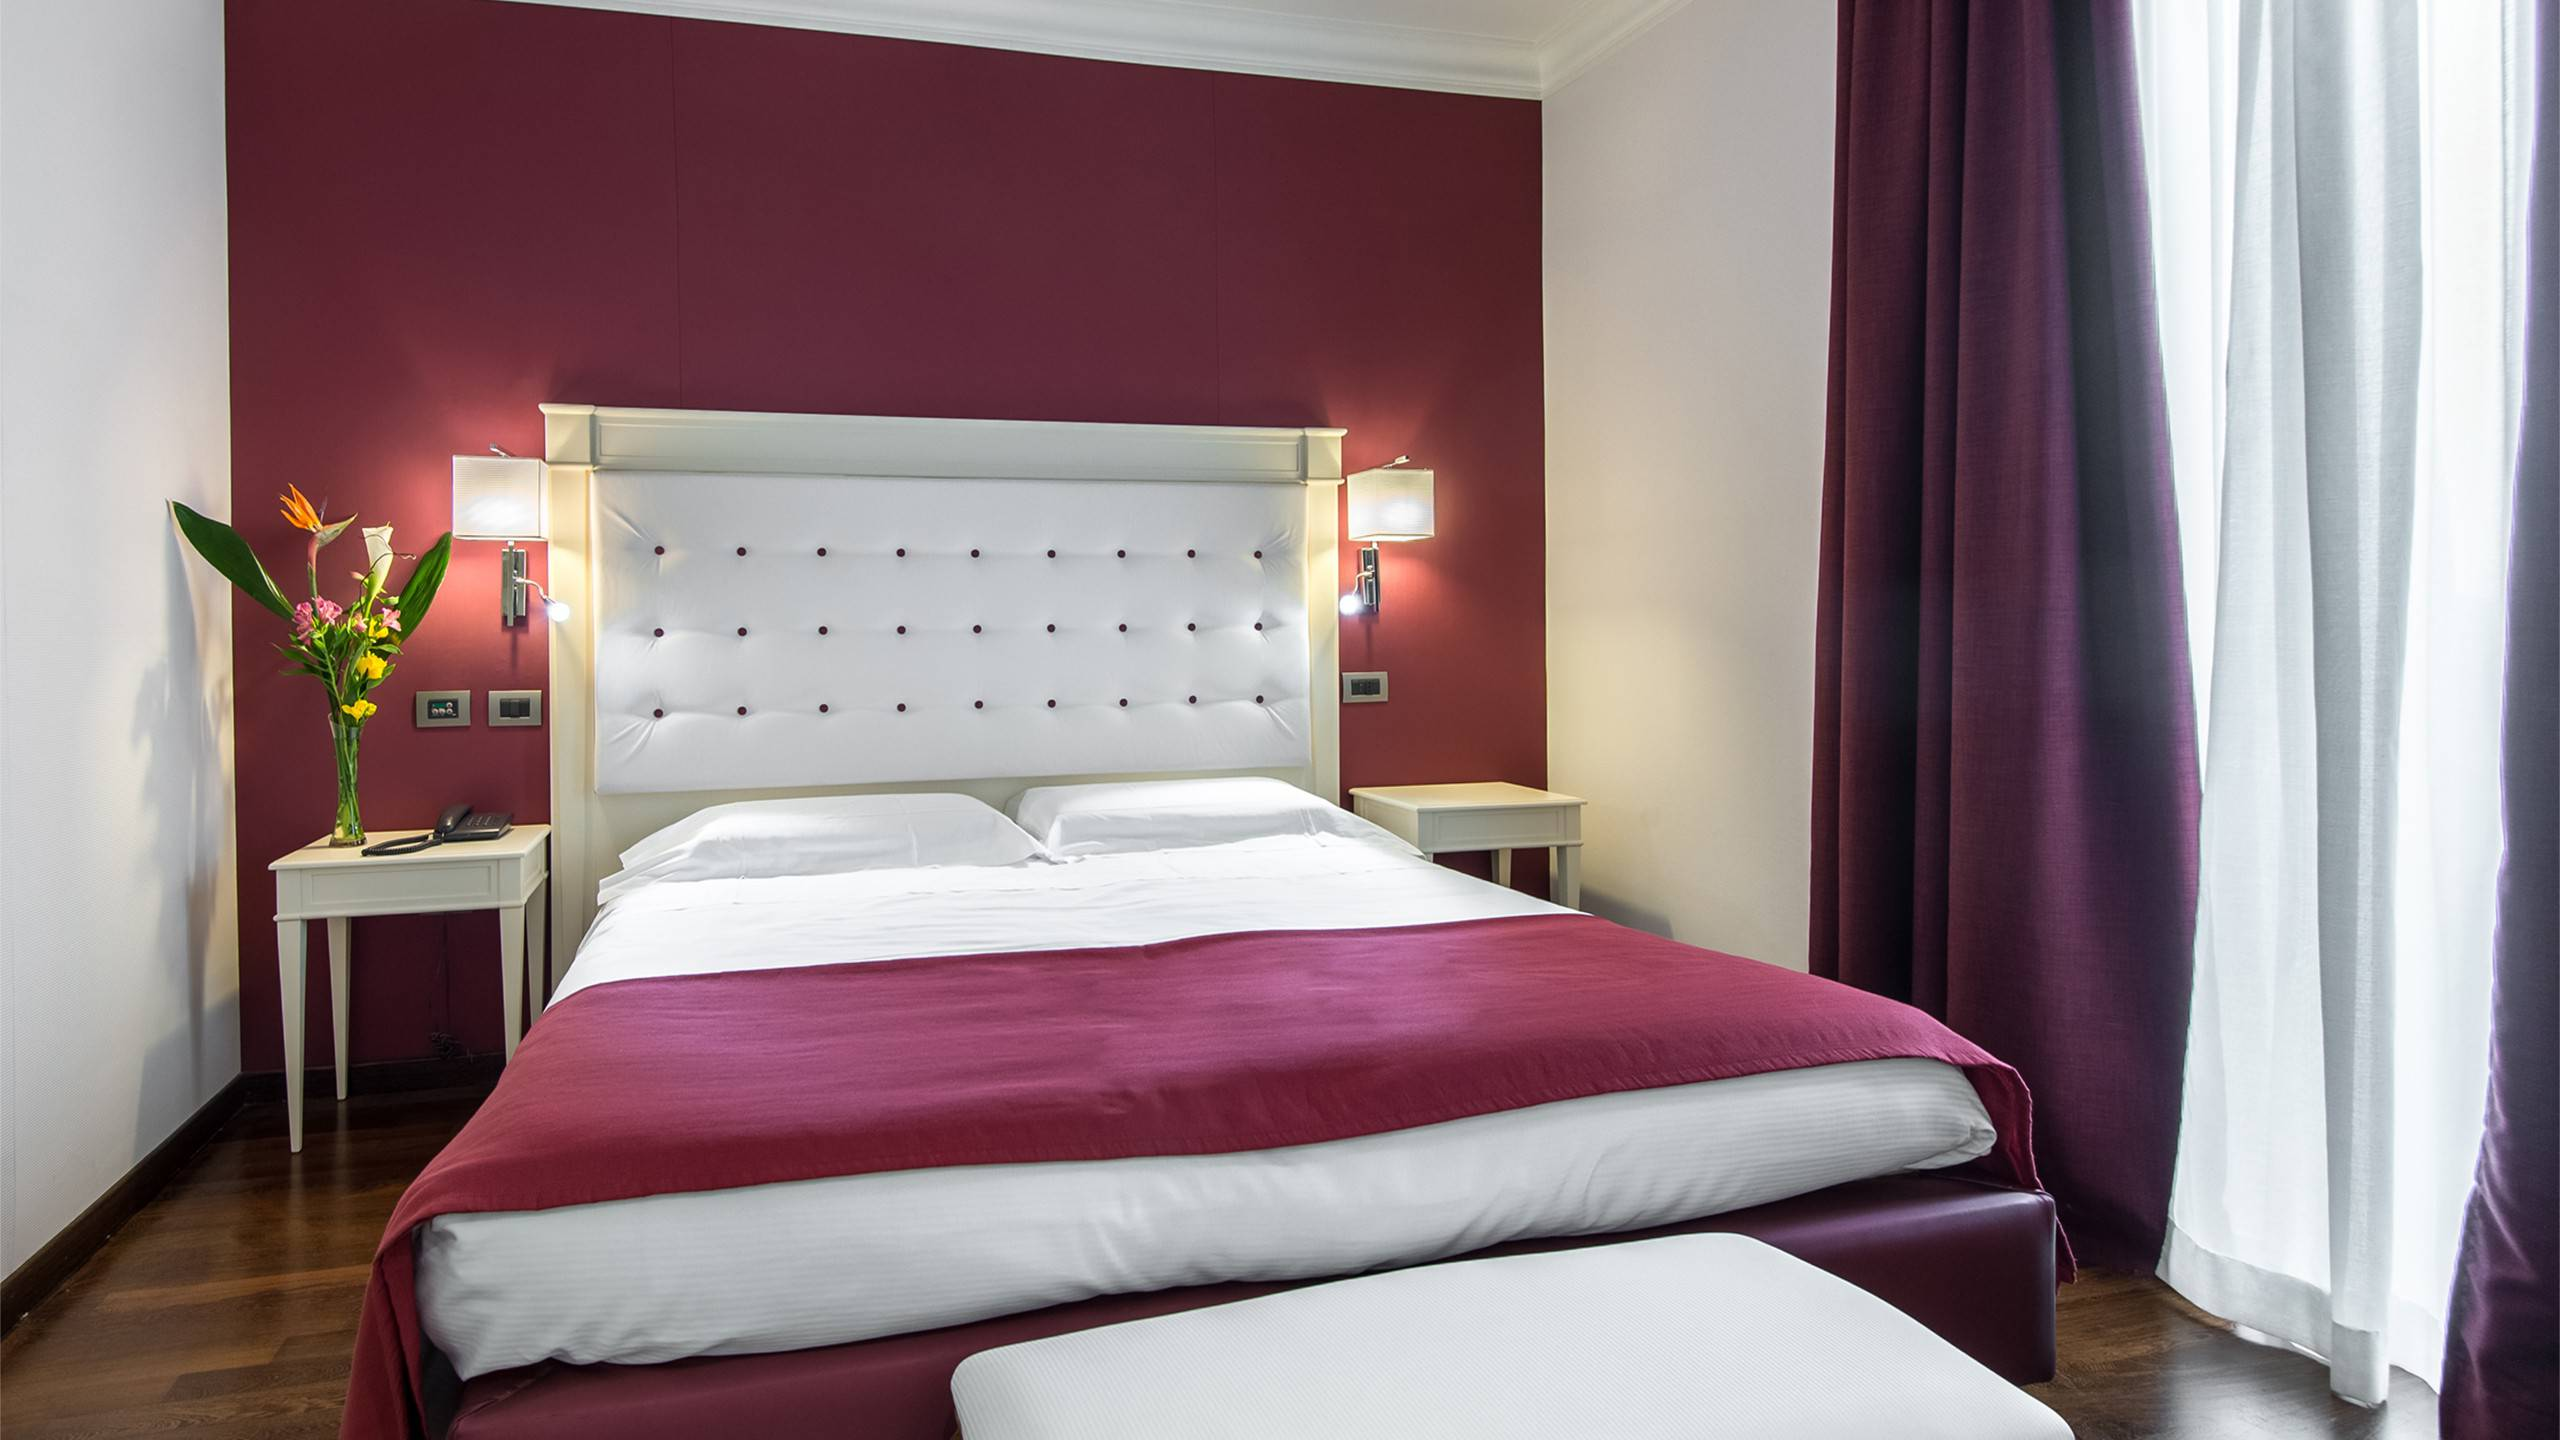 Hotel-Trilussa-Palace-camera-120